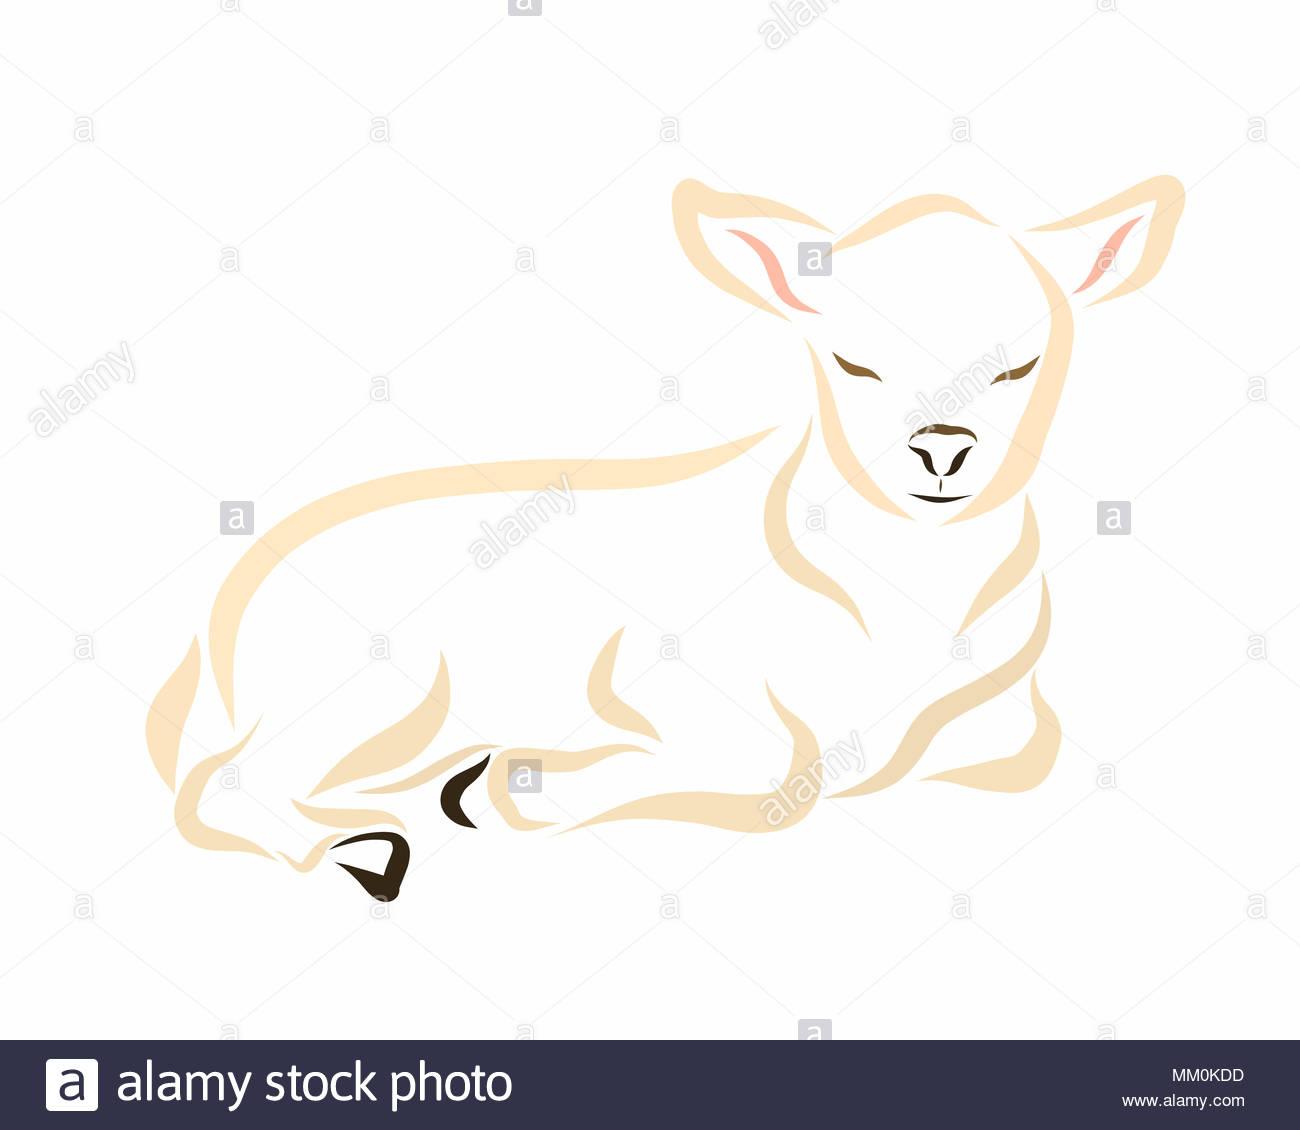 Sleeping Lamb Or Calf Pet Or Christian Symbol Stock Photo